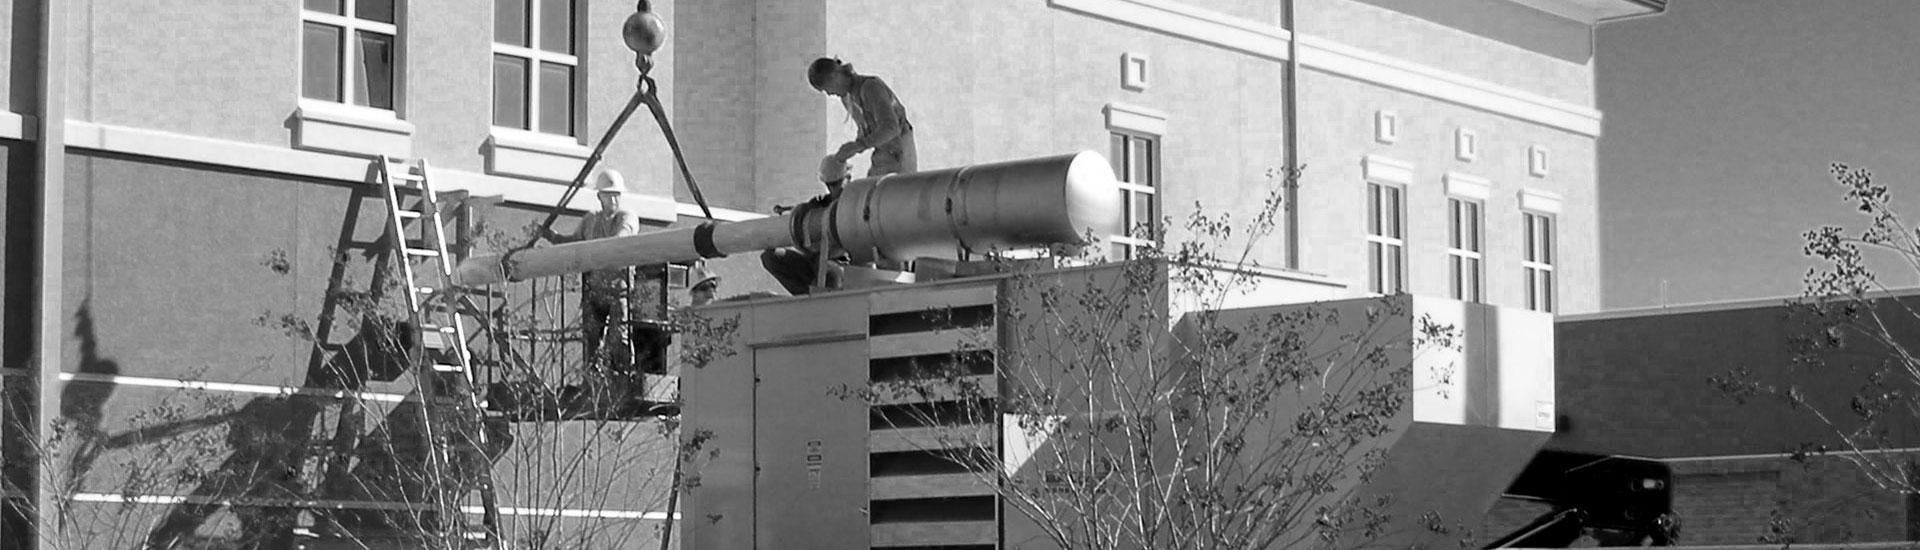 afcs-generator-bw